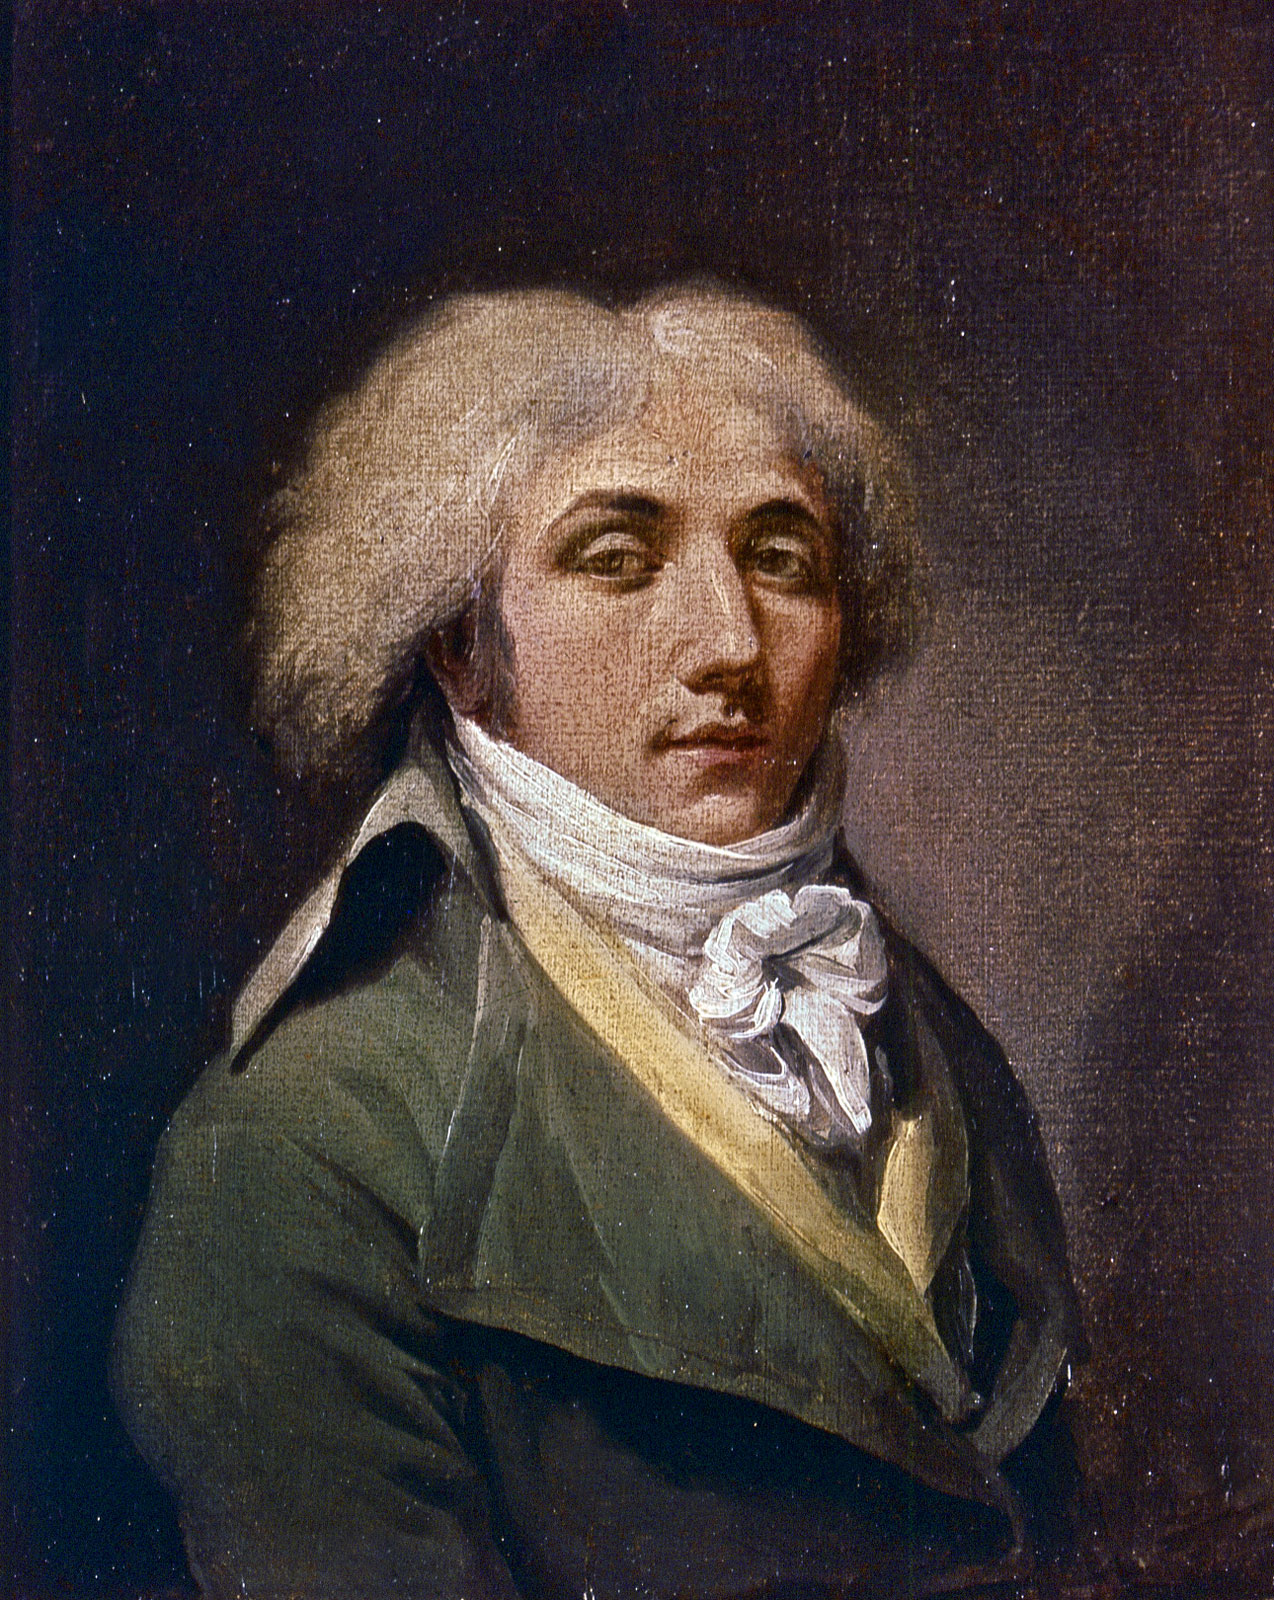 Auto-retrato, 1795, Louis-Léopeold Boilly (França, 1761-1845) ost, Museu de Belas Artes de Lille